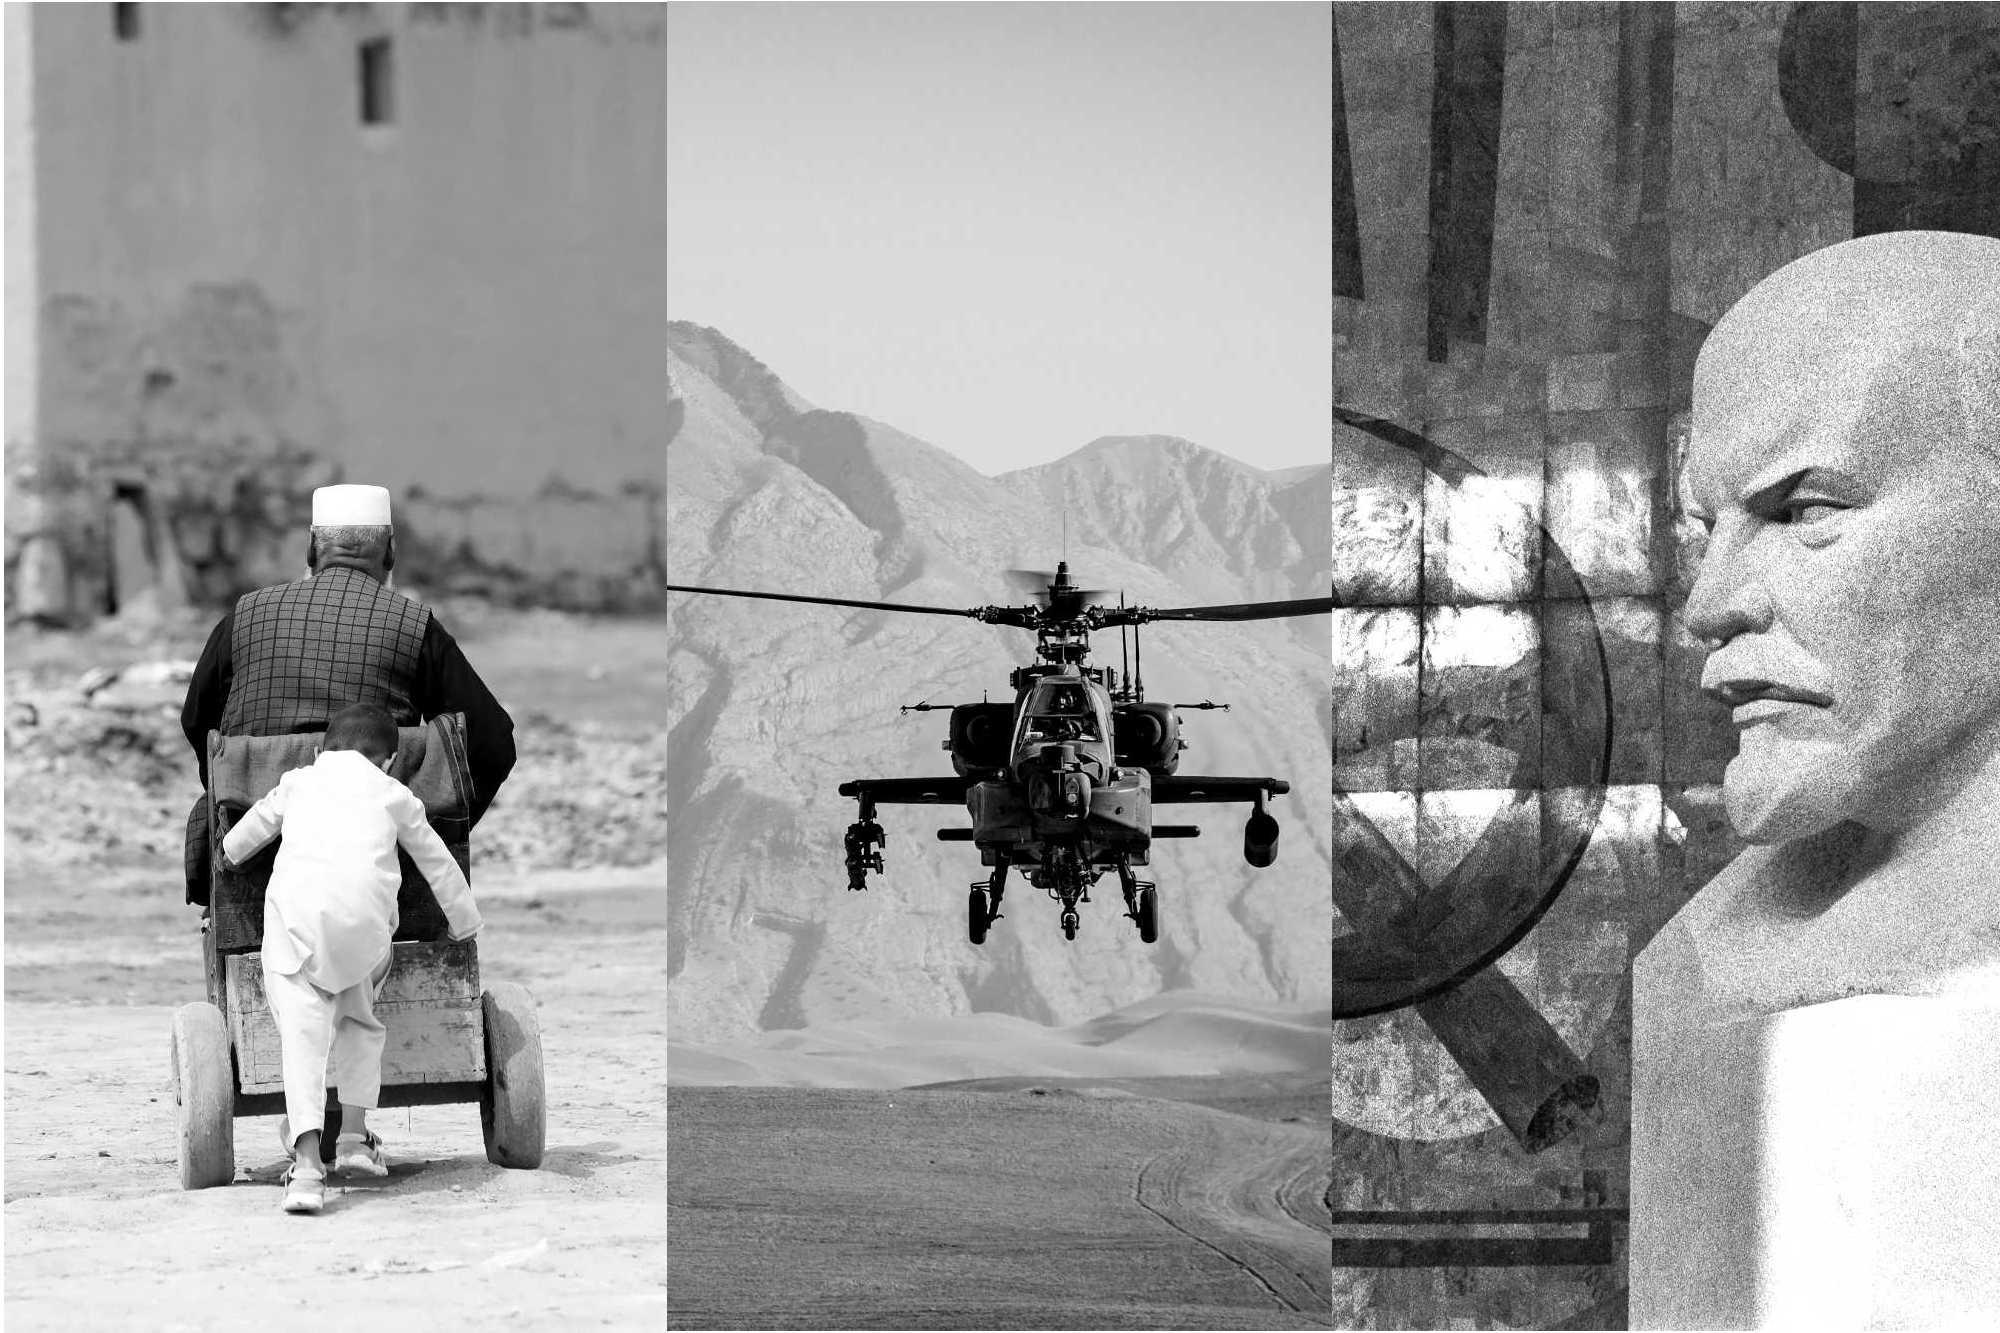 Afghanistan, cosa succede: guerra, invasione sovietica, perché è importante